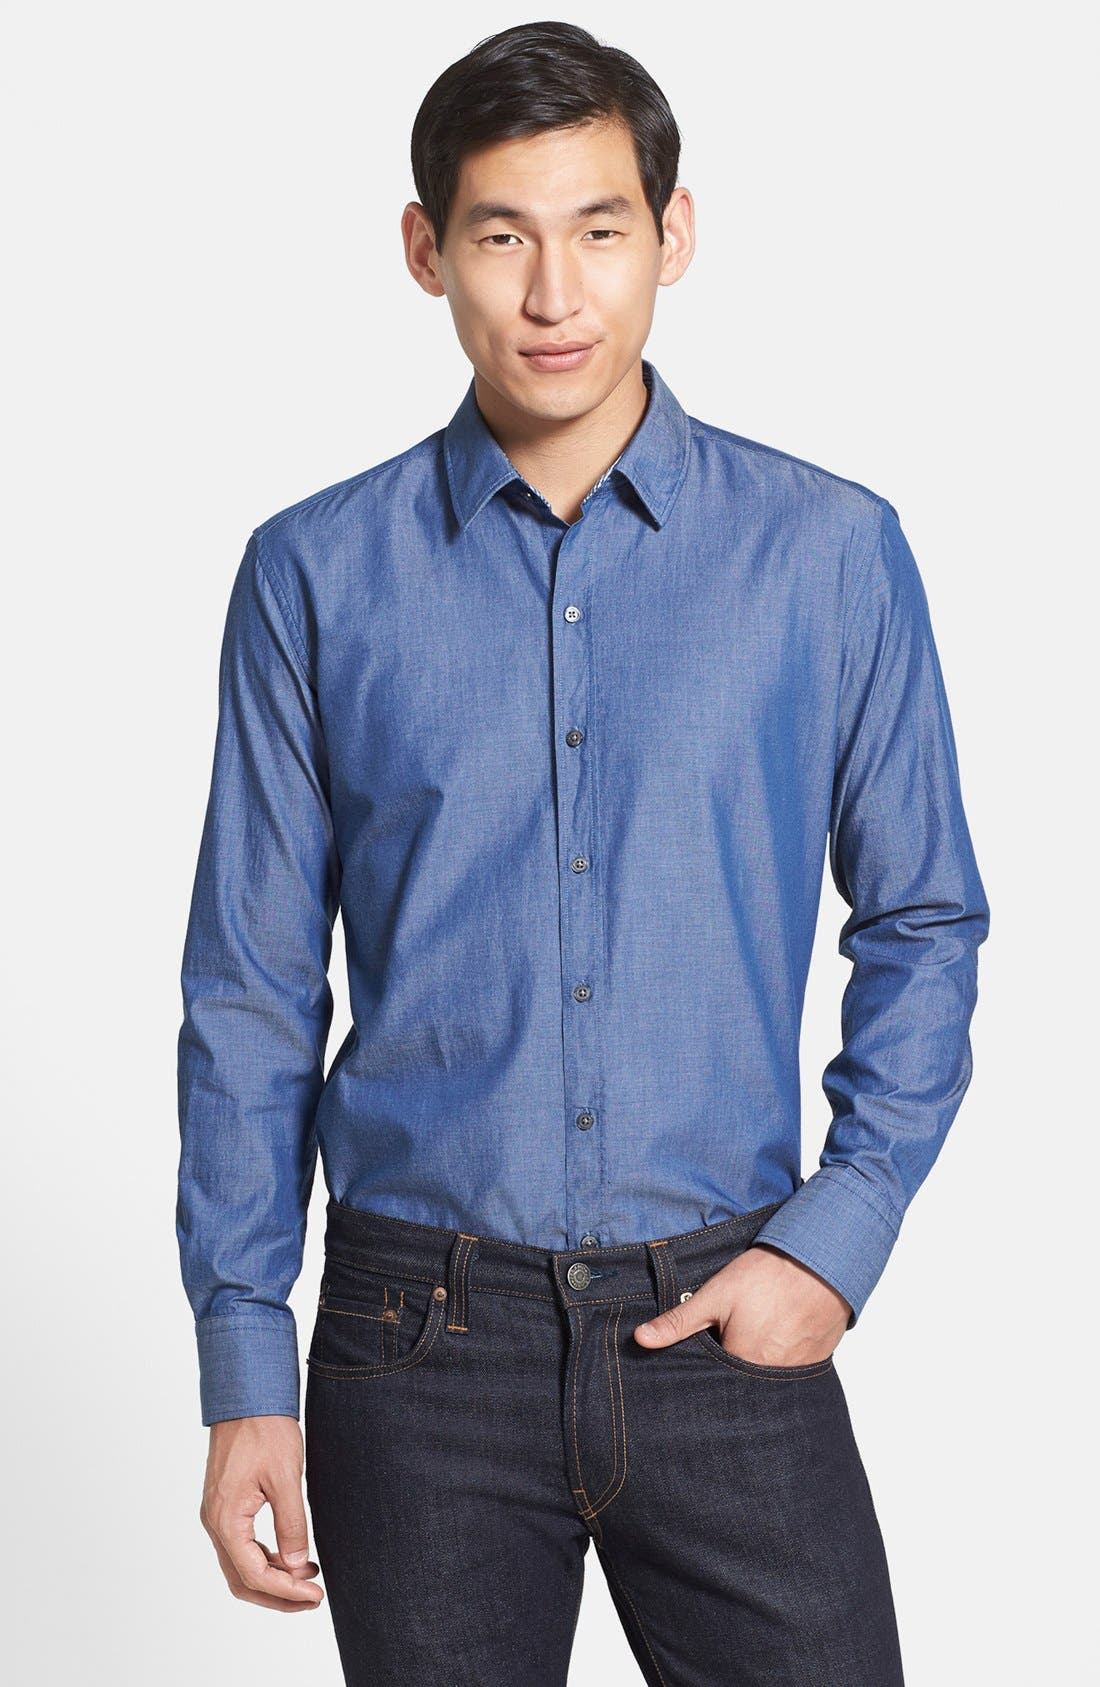 Alternate Image 1 Selected - BOSS HUGO BOSS 'Robbie' Slim Fit Sport Shirt